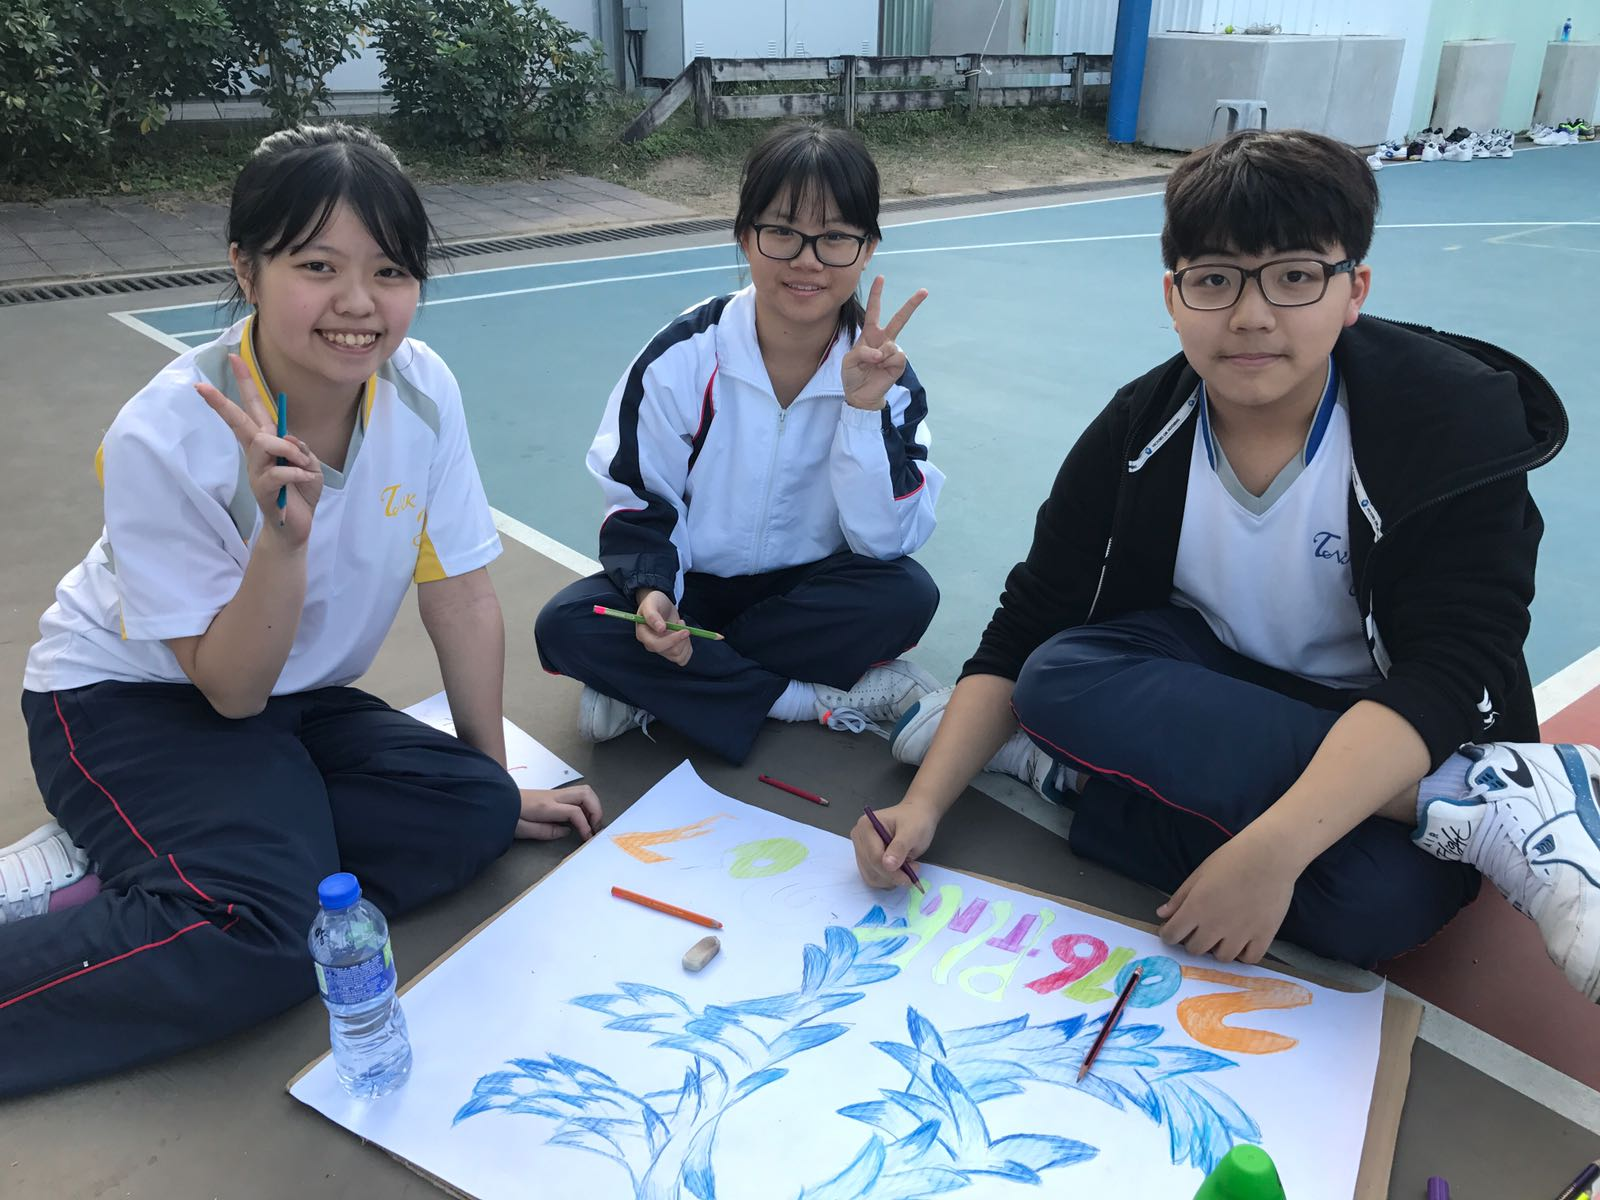 Students use their creativity to design their class flag.